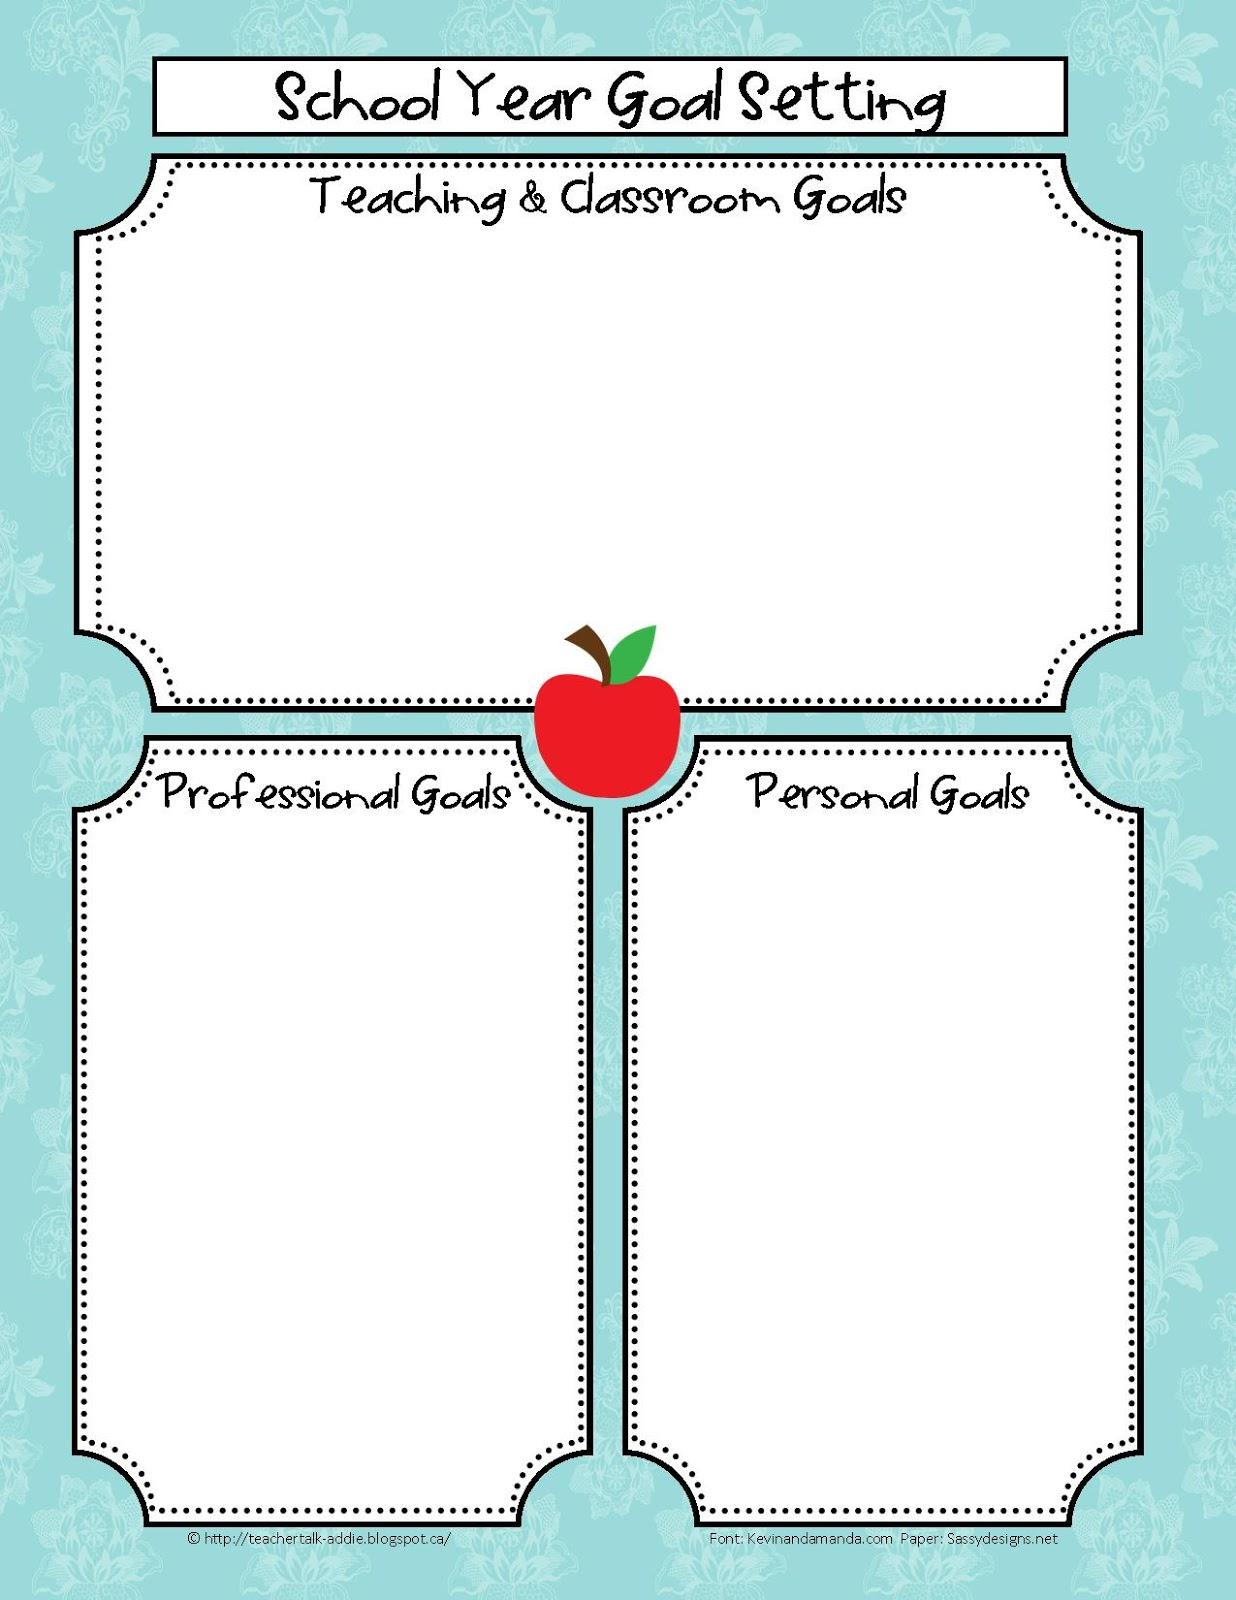 Addie Education Teacher Talk Back To School Teaching Goals #4weAYs.